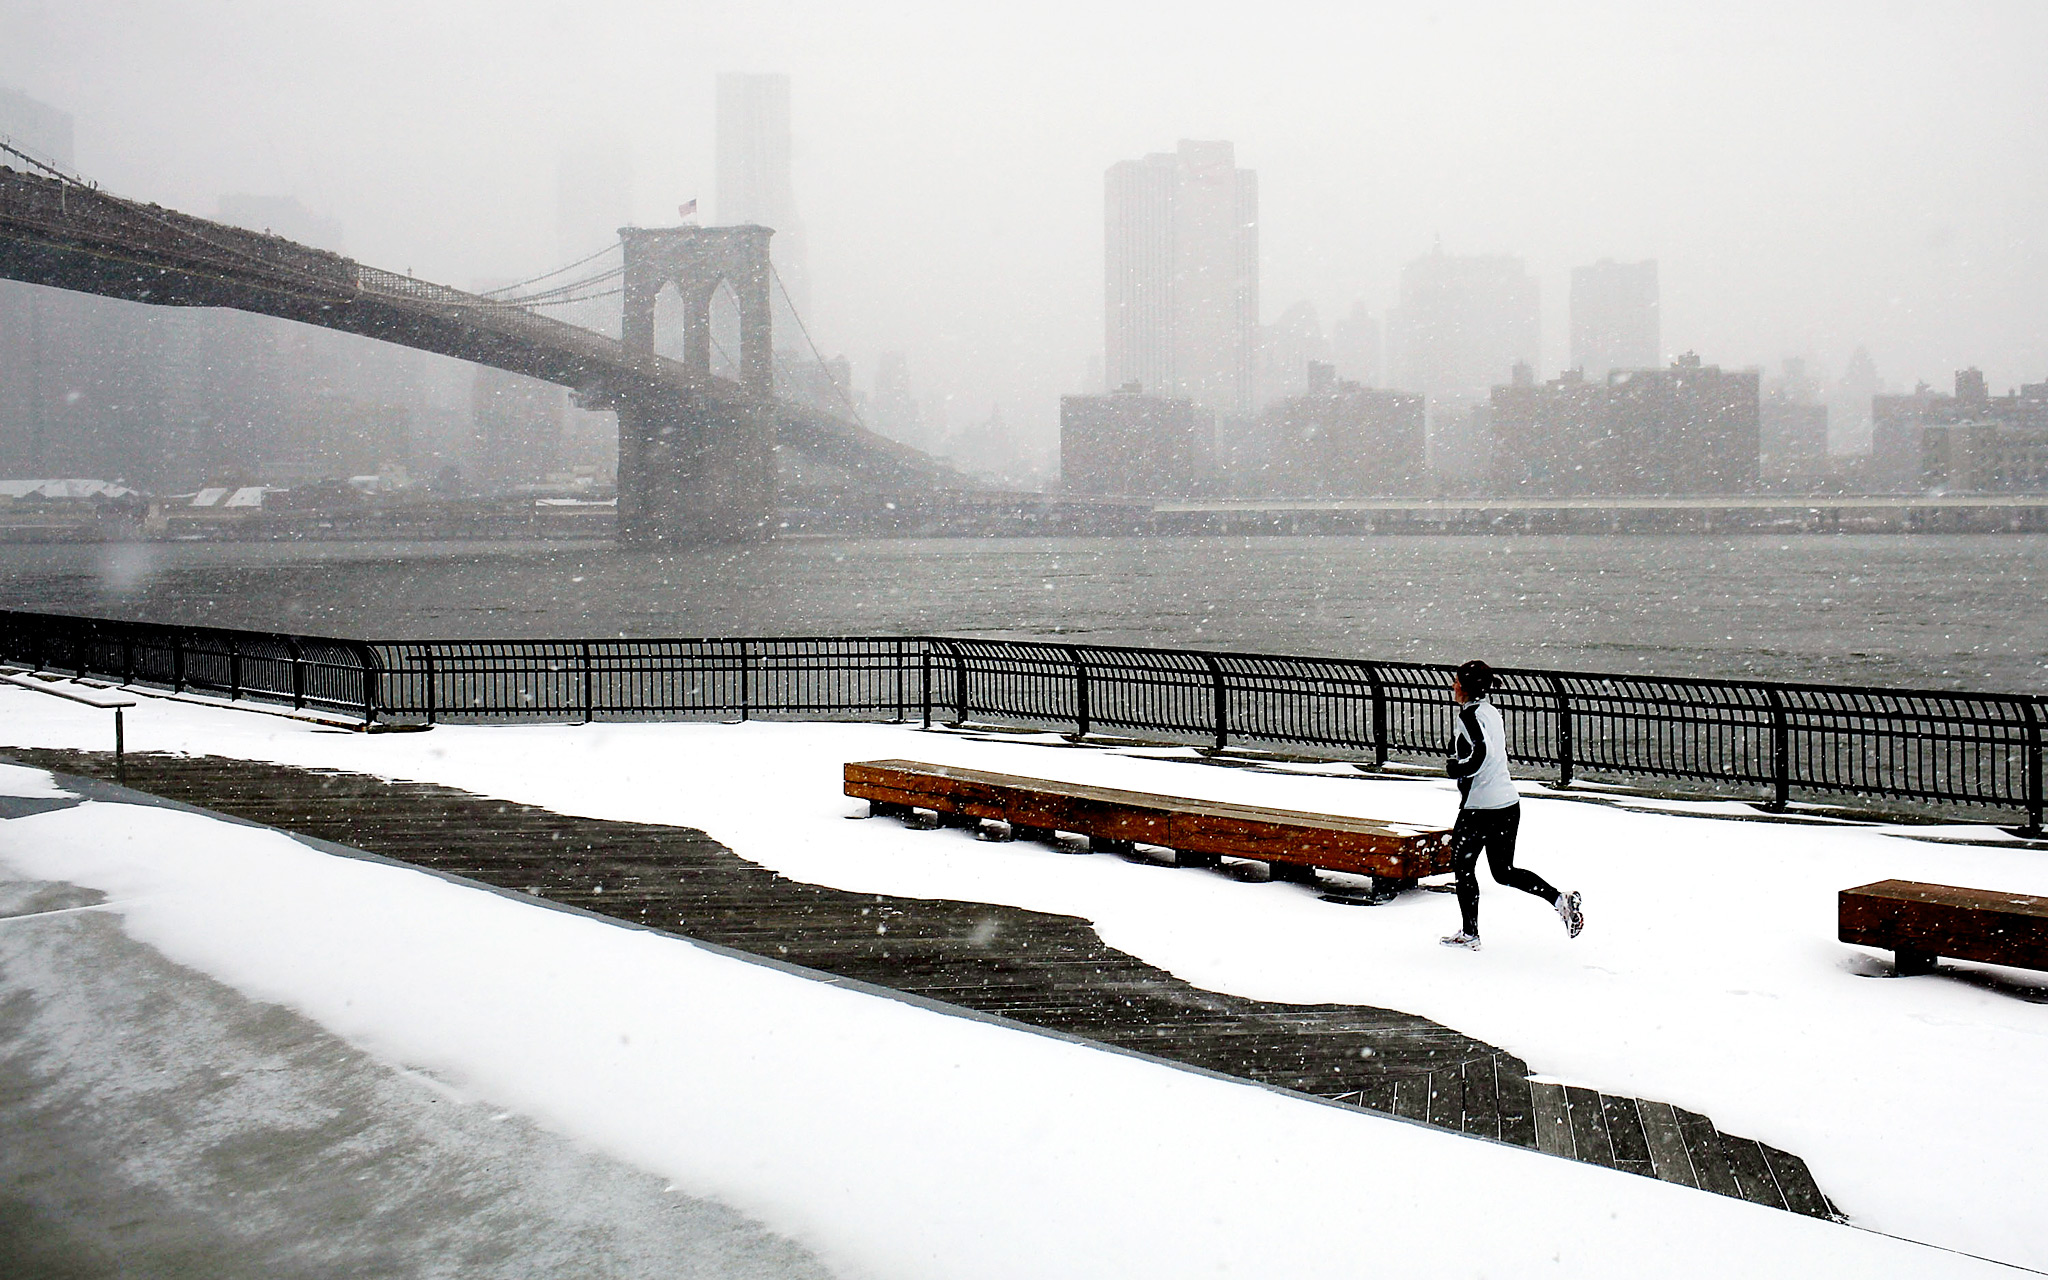 Running by the Brooklyn Bridge